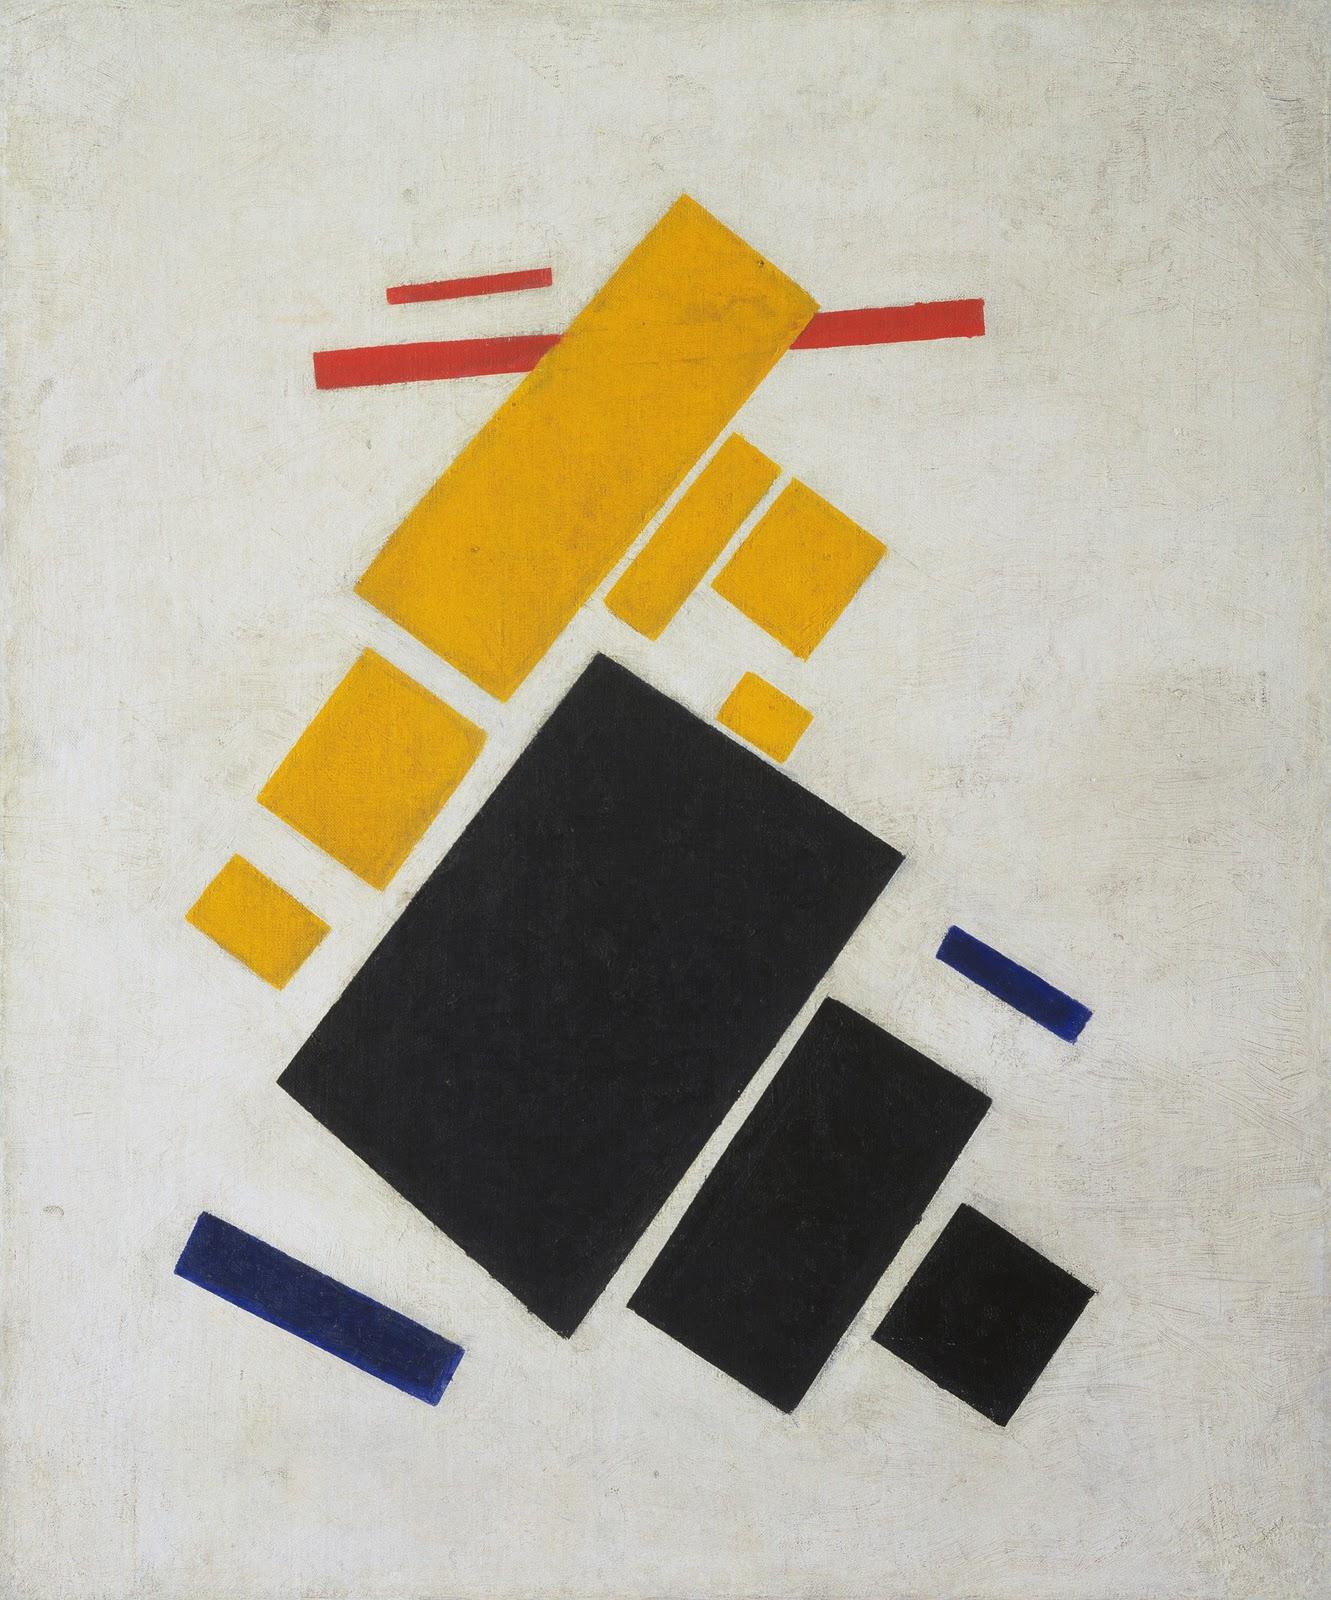 Suprematist Composition: Airplane Flying - Suprematist Composition